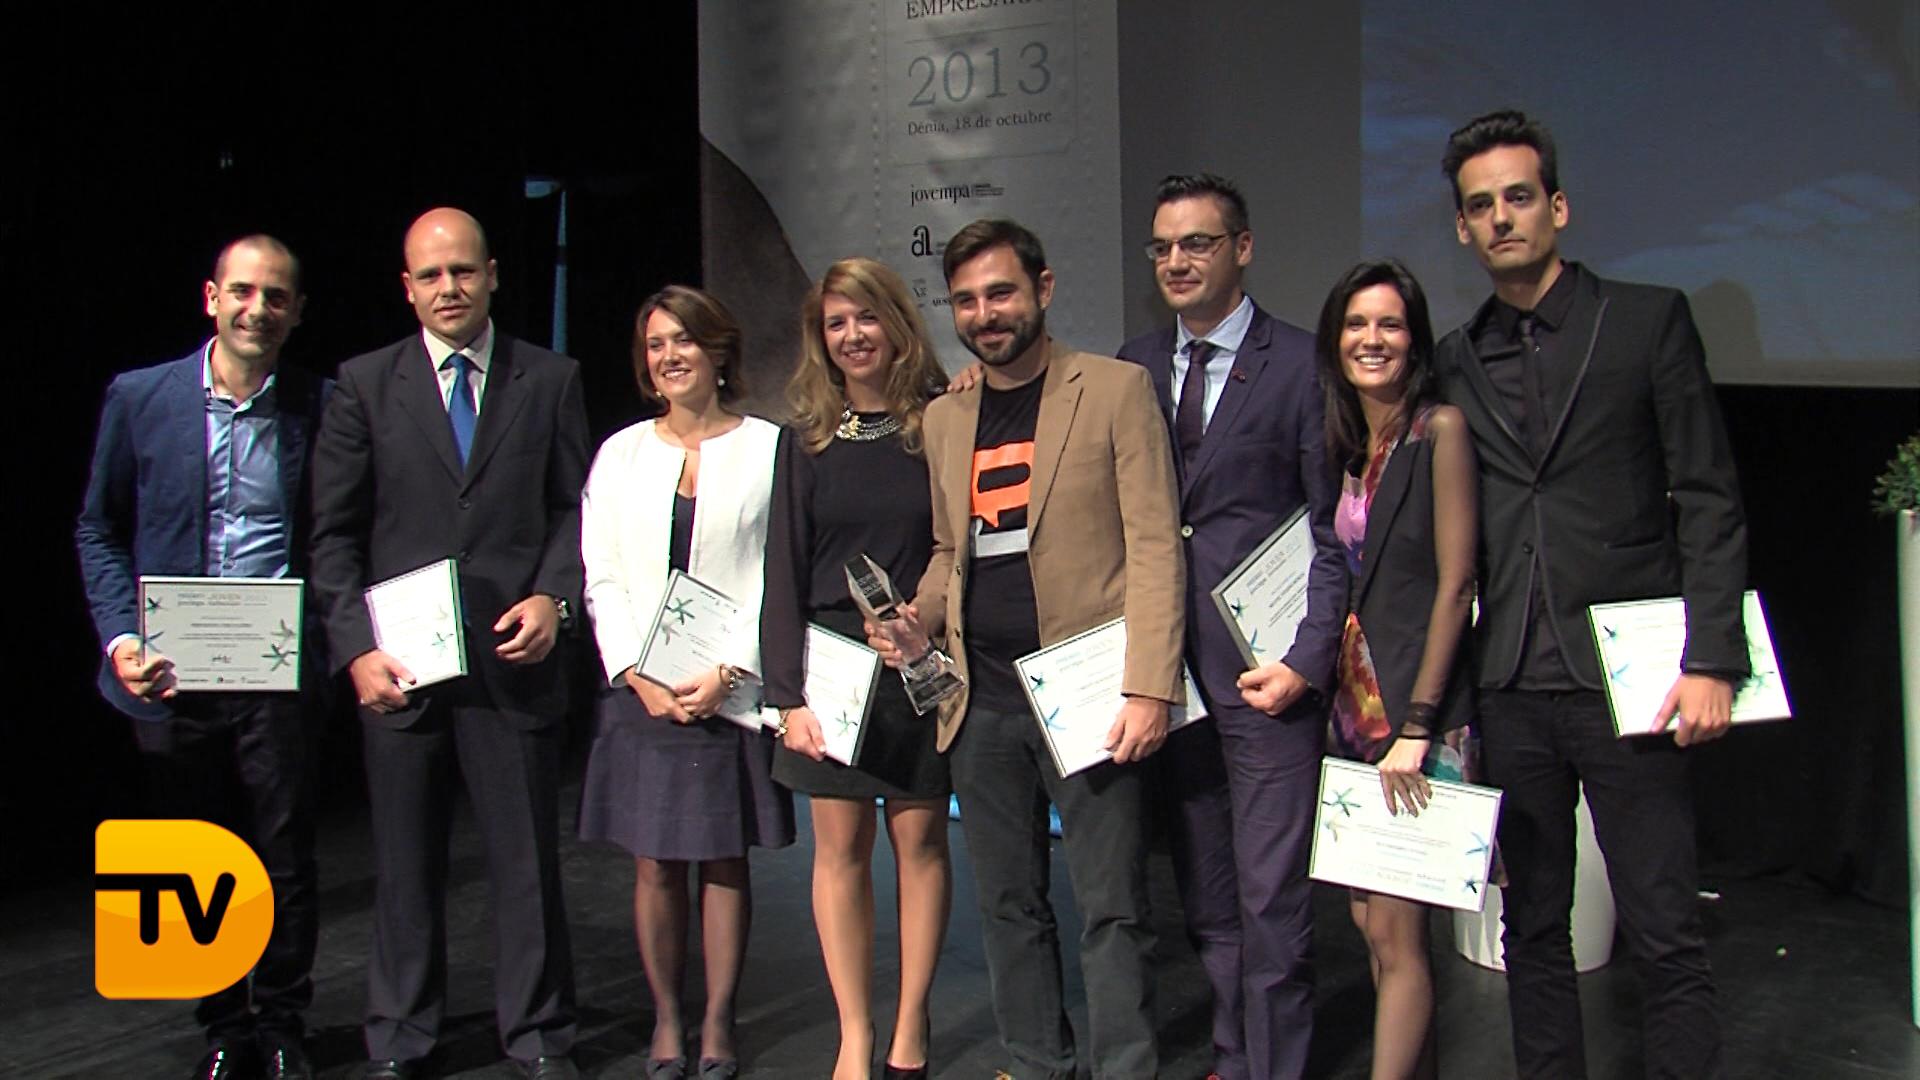 premios jovempa 2013- 2